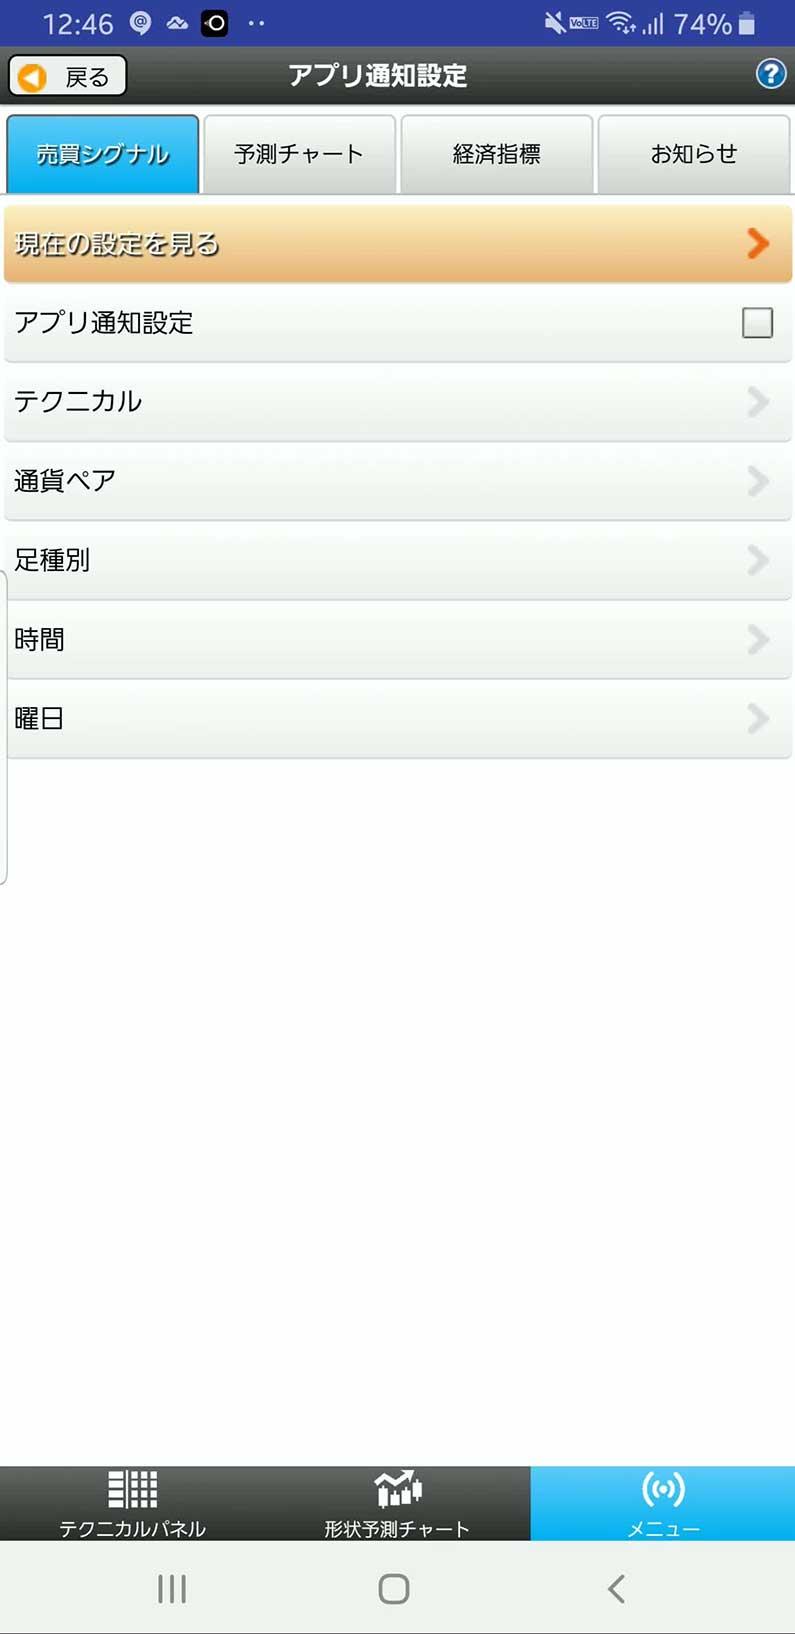 JNB-FX PLUSの「テクニカるナビ」でのアプリ内通知一覧